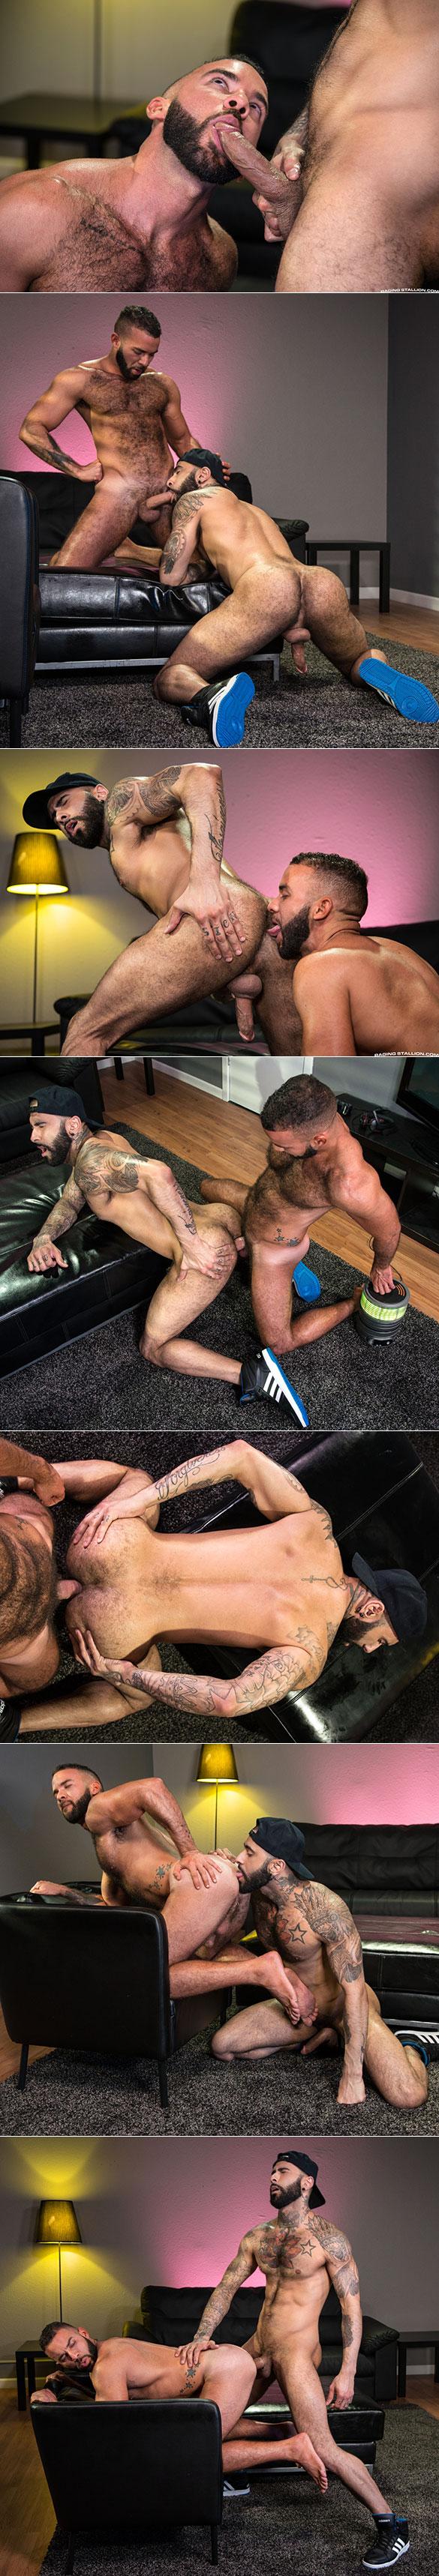 "Raging Stallion: Rikk York and Fernando Del Rio flip fuck in ""Gaymers"""